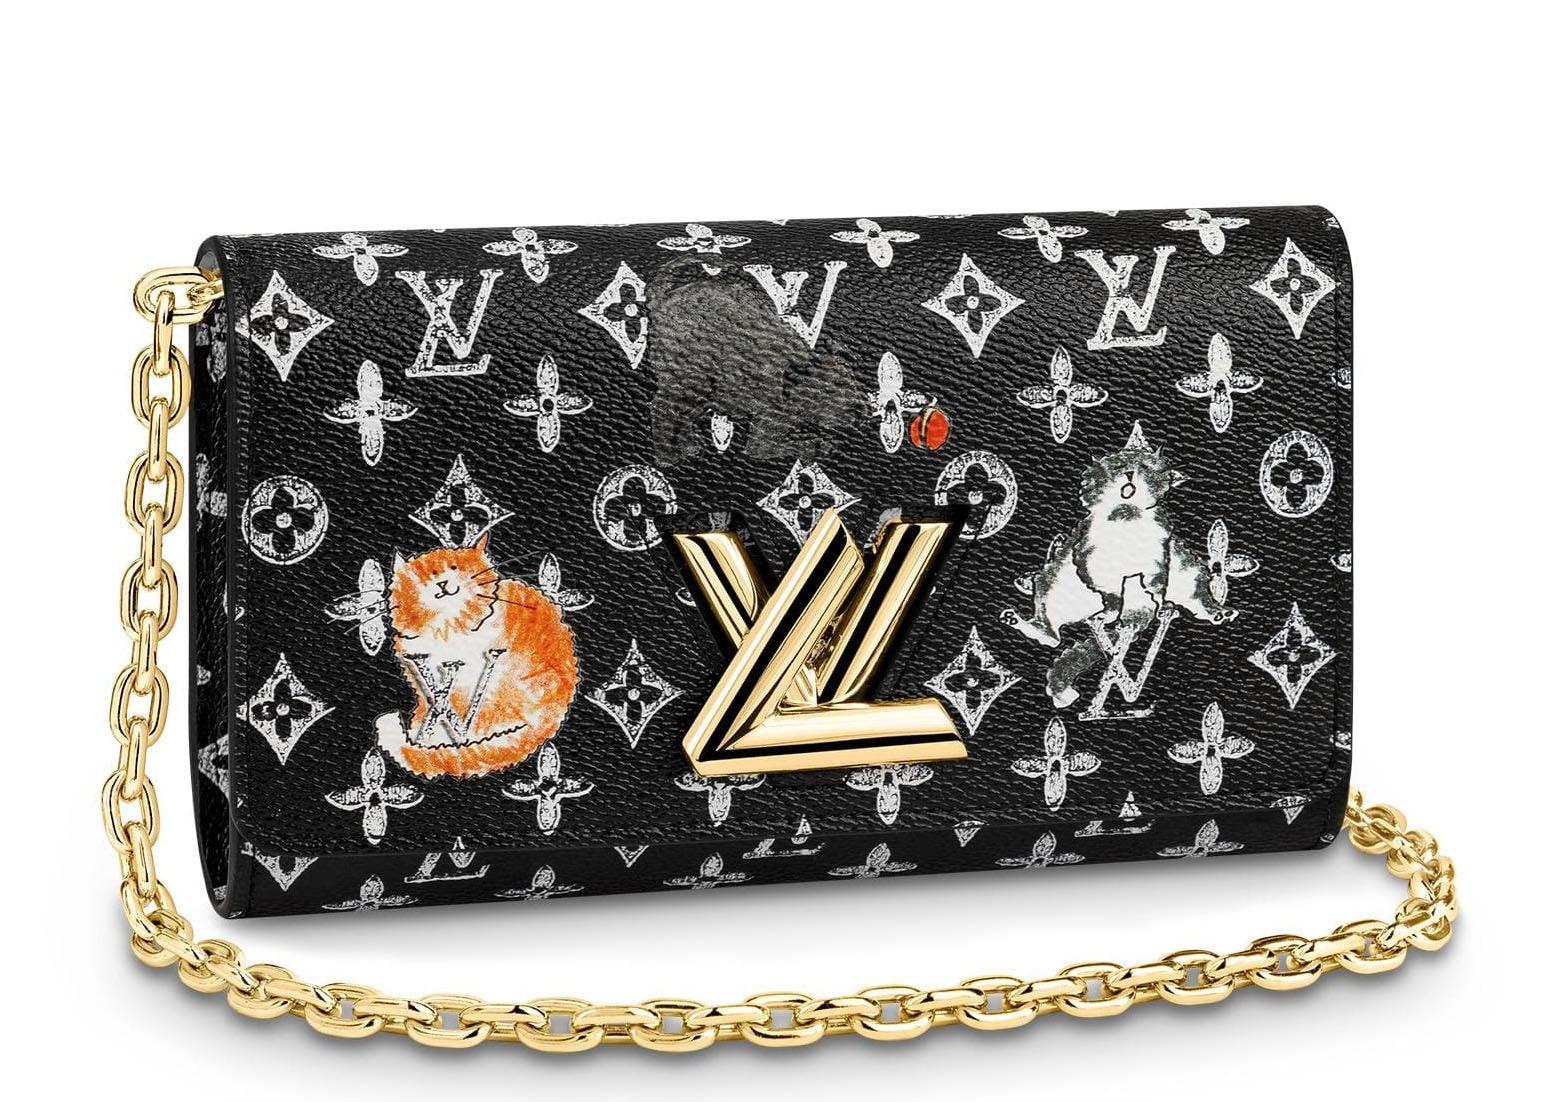 Louis Vuitton Twist Chain Wallet Monogram Catogram Black/White